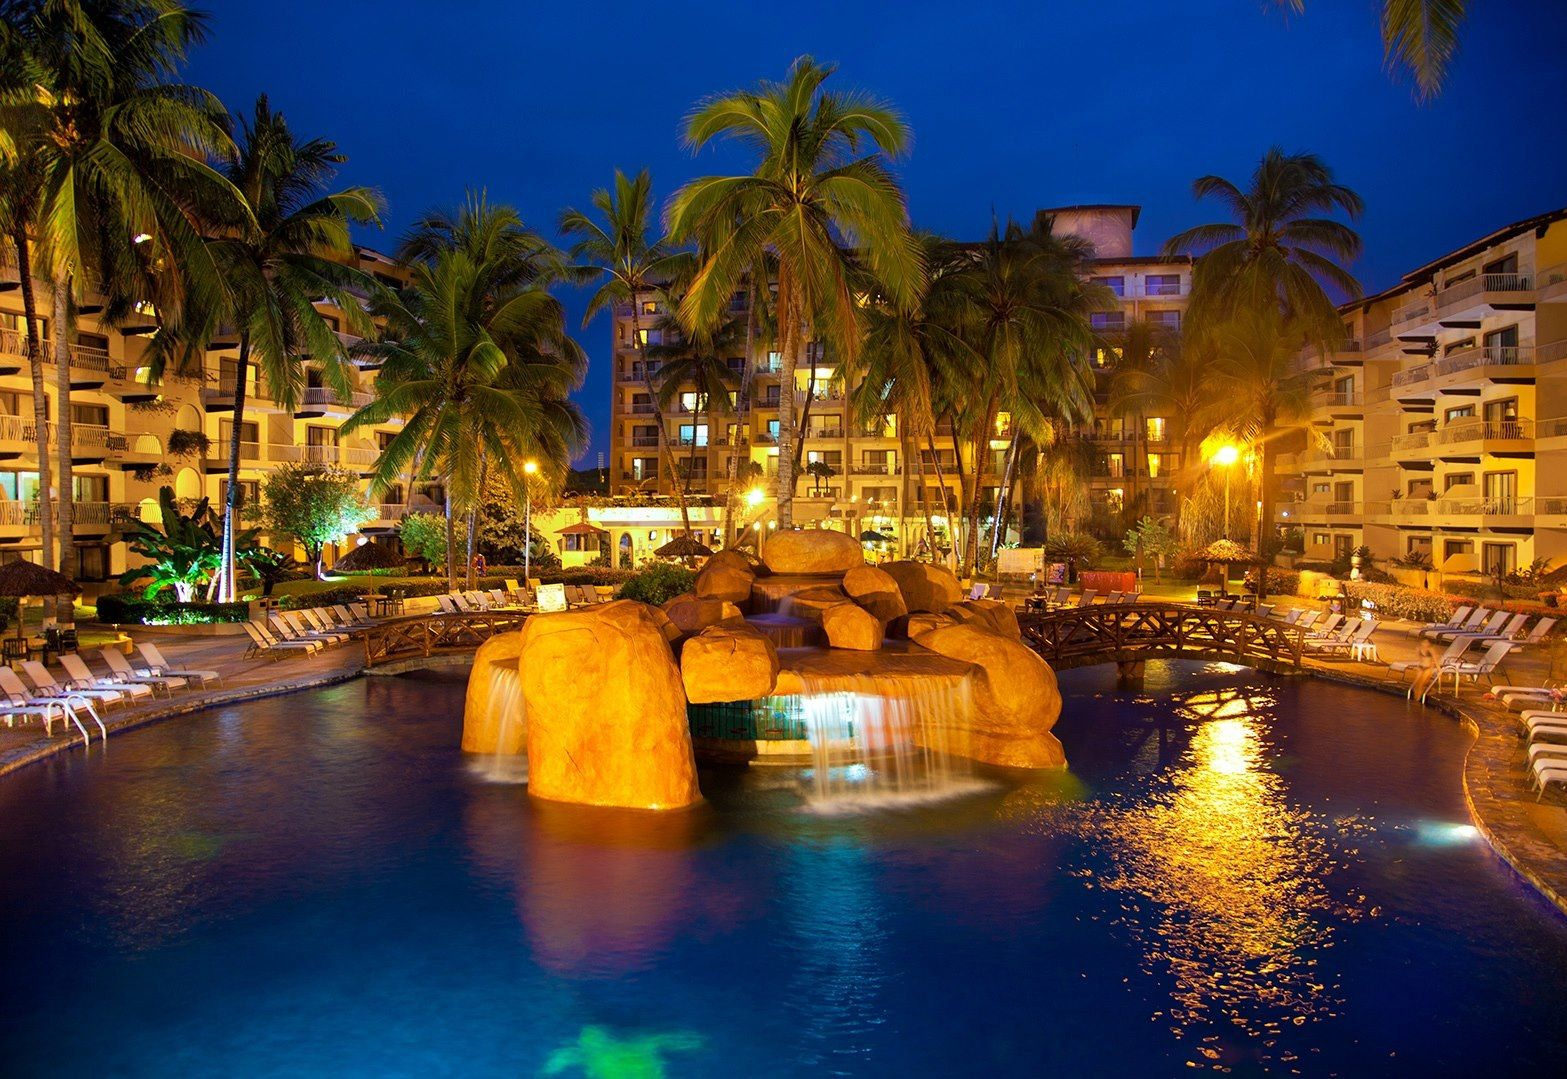 The Villa Del Palmar Beach Resort And Spa Our Favorite Hotel In Puerto